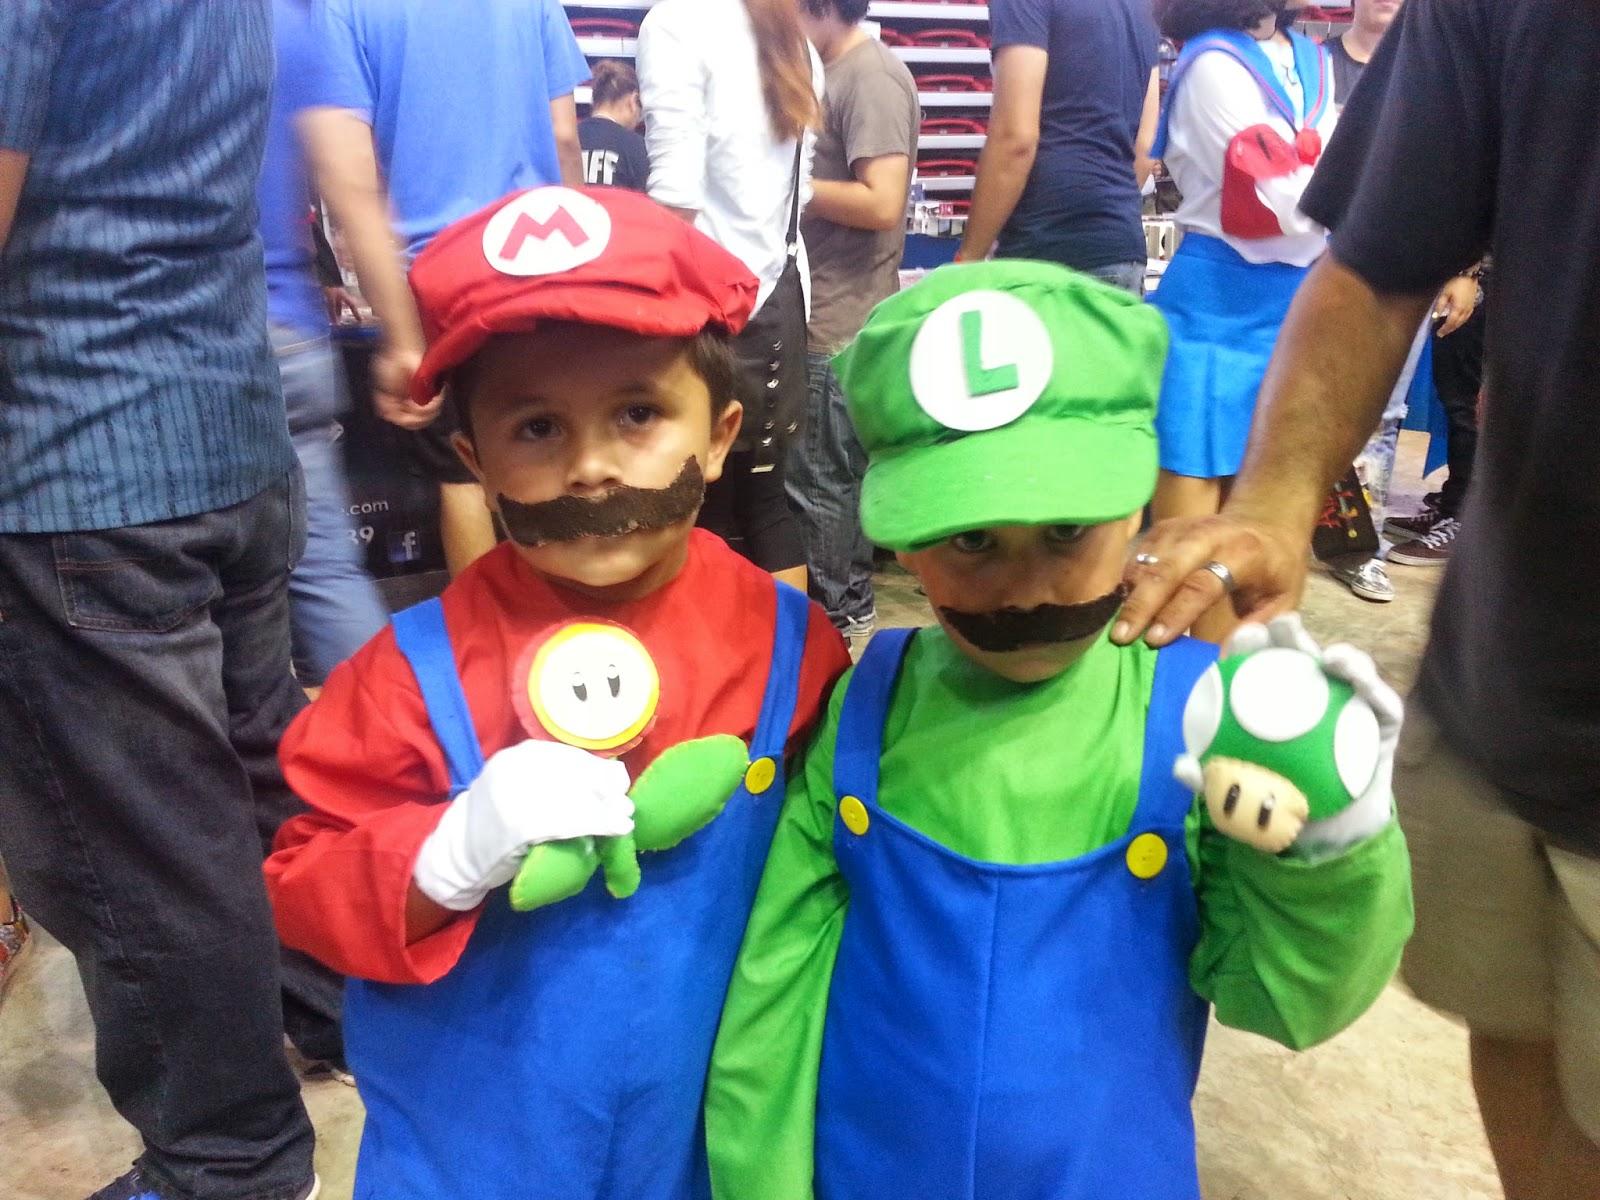 Cosplay Baby Mario and Luigi